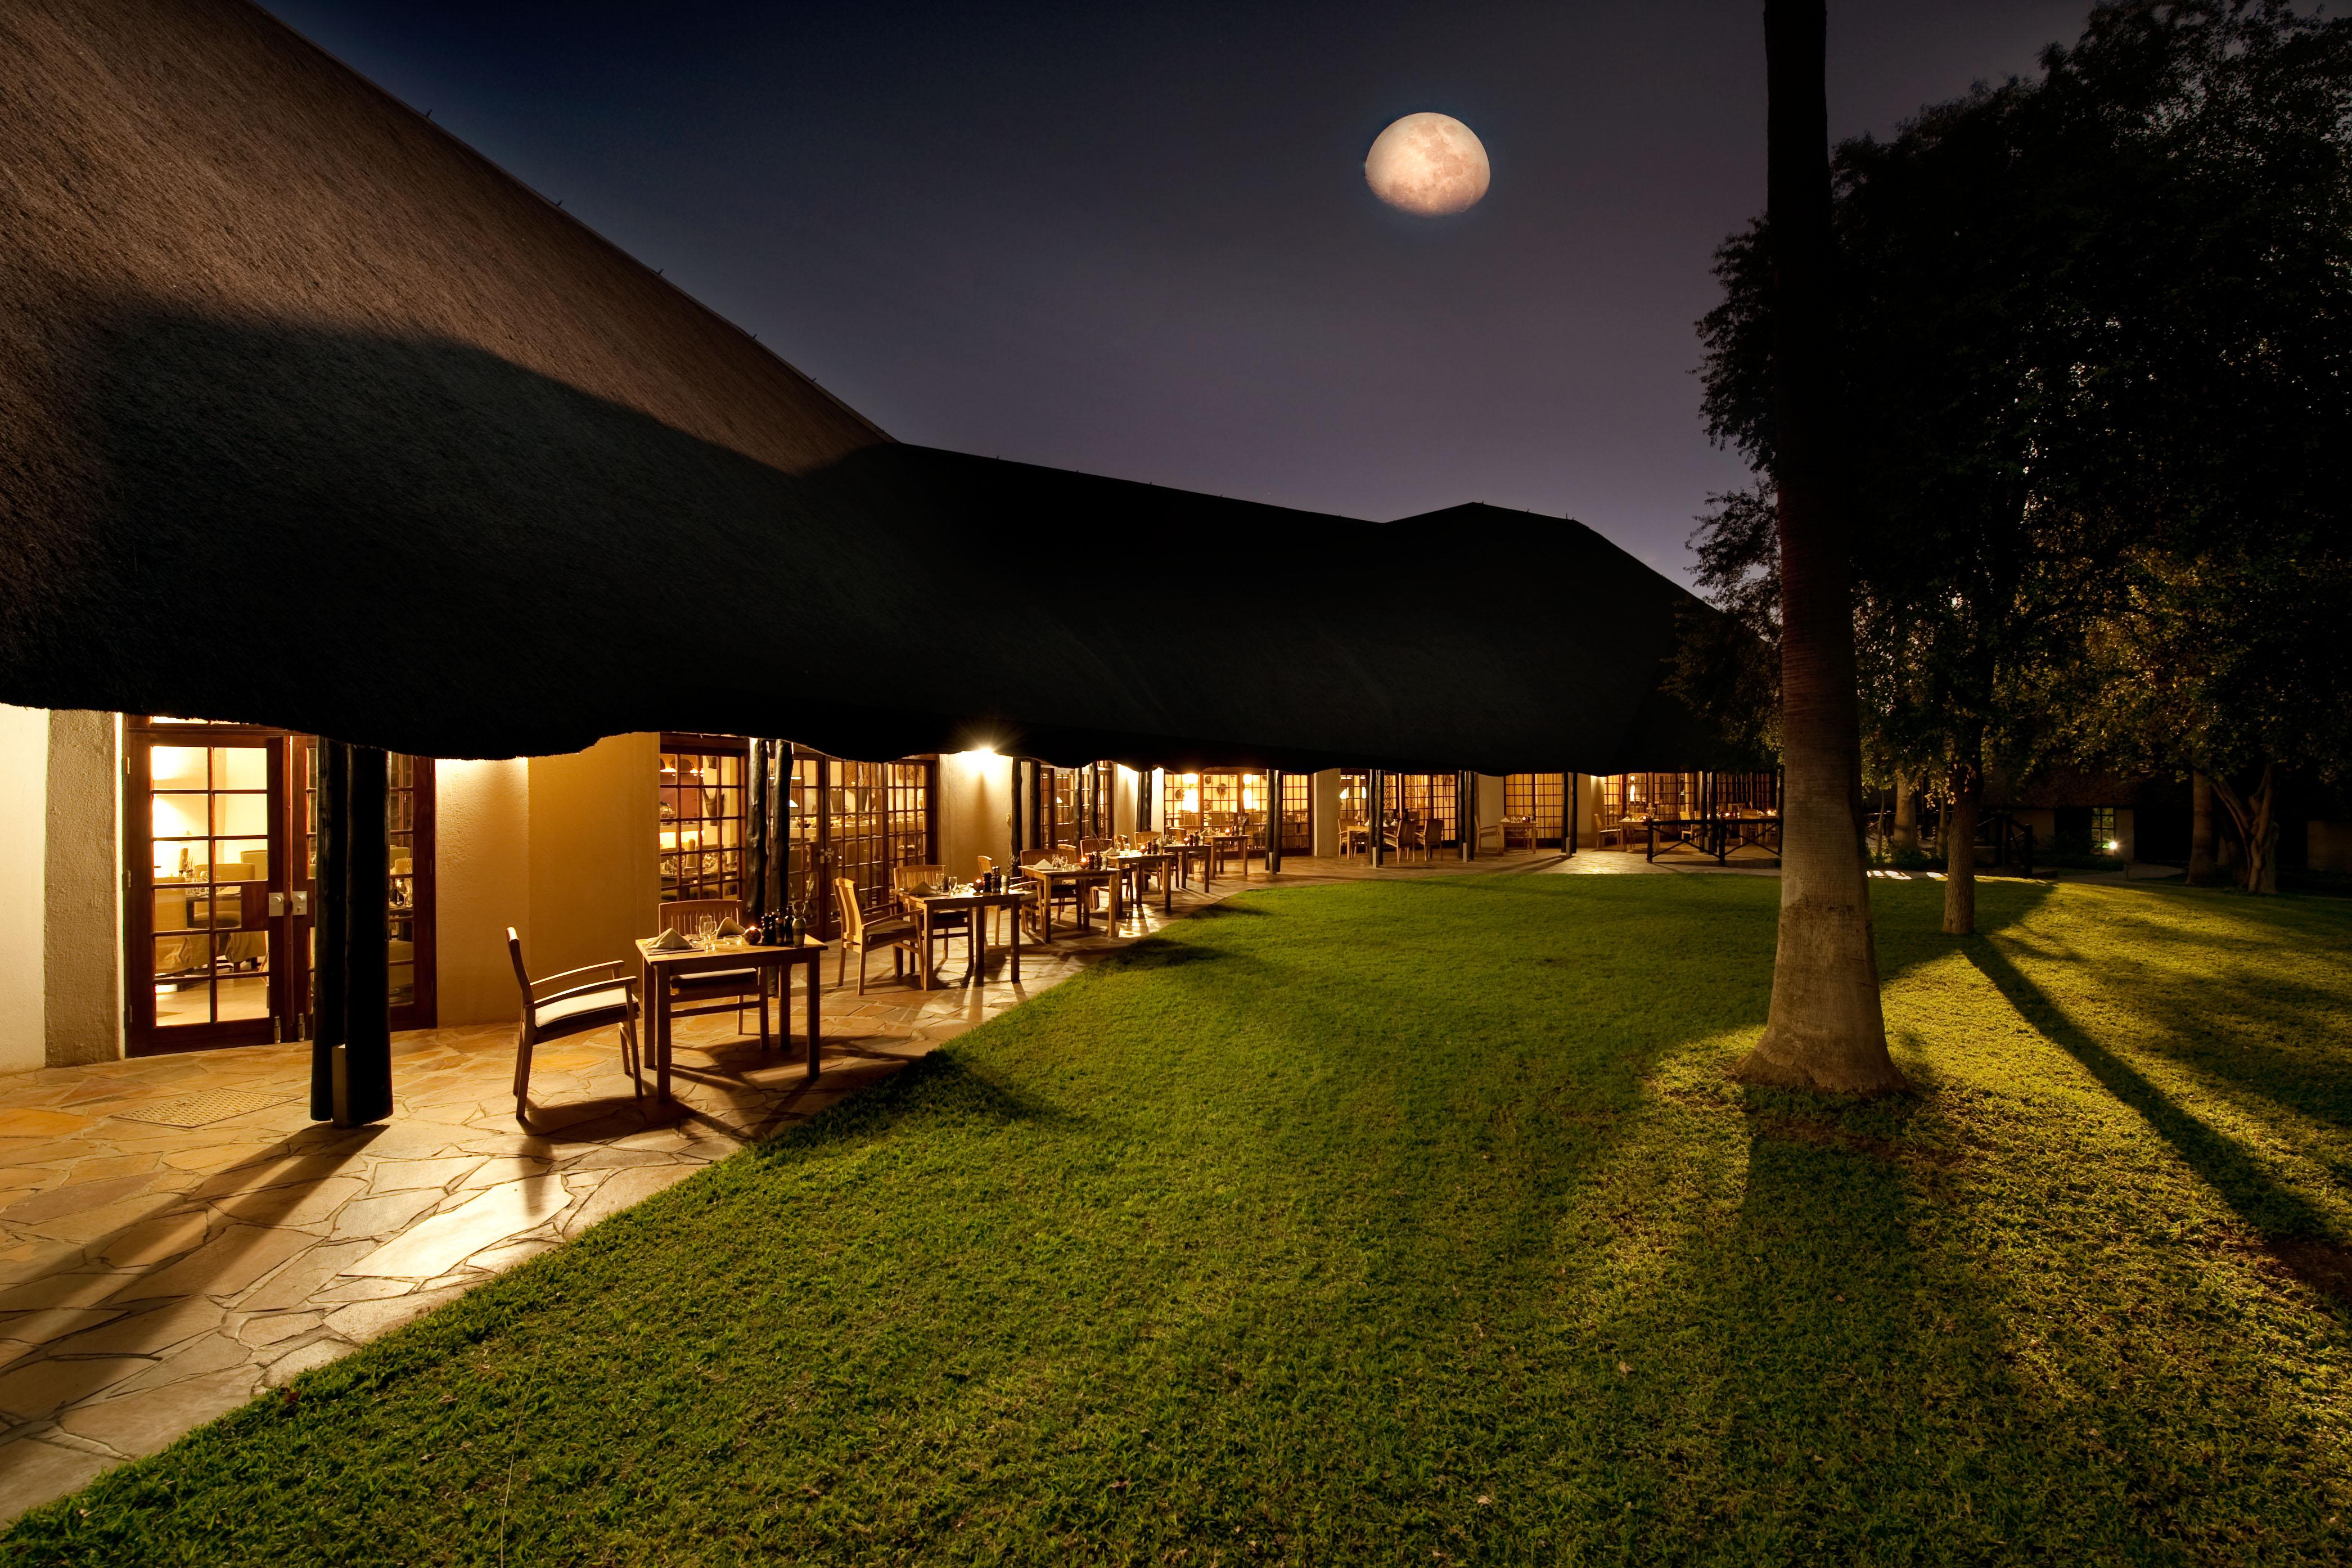 Mokuti Etosha Lodge : MokutiEtoshaLodge DiningRoomOutdoor 1 from rack.puresafari.com size 4182 x 2788 jpeg 2024kB